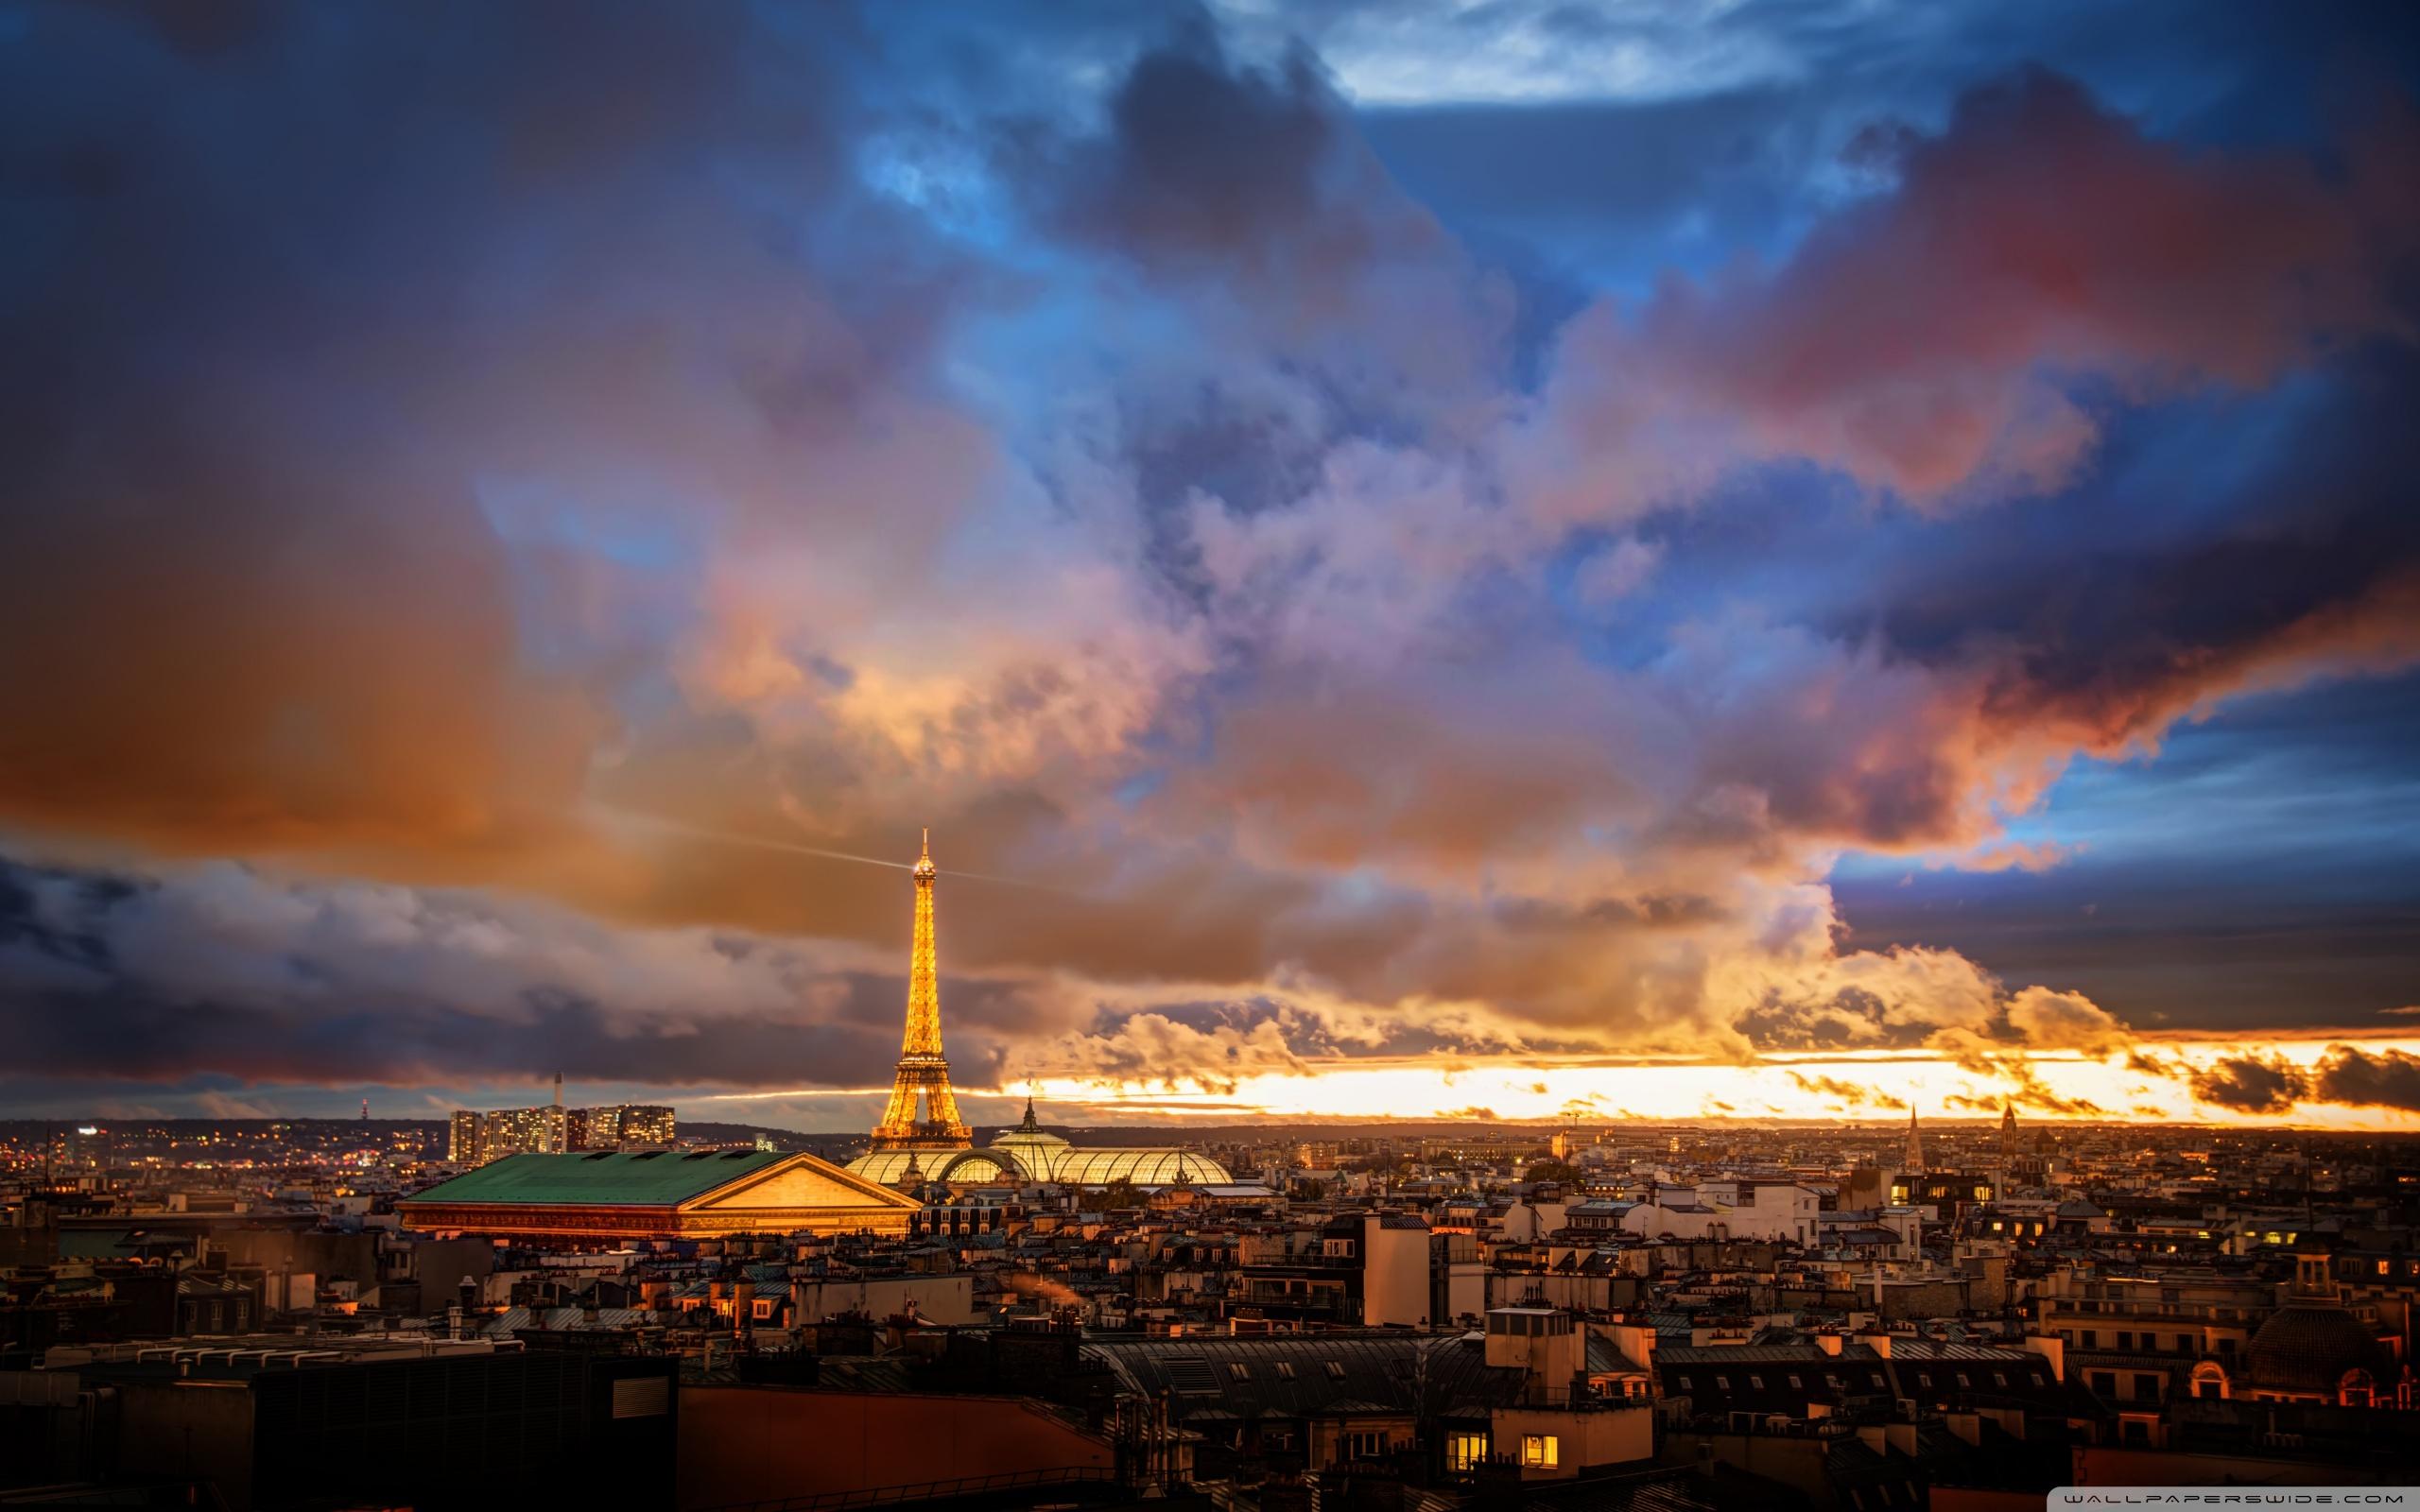 Free Download Romantic Night In Paris 4k Hd Desktop Wallpaper For 4k Ultra Hd 2560x1600 For Your Desktop Mobile Tablet Explore 25 Paris Night Wallpaper Paris Night Wallpaper Paris